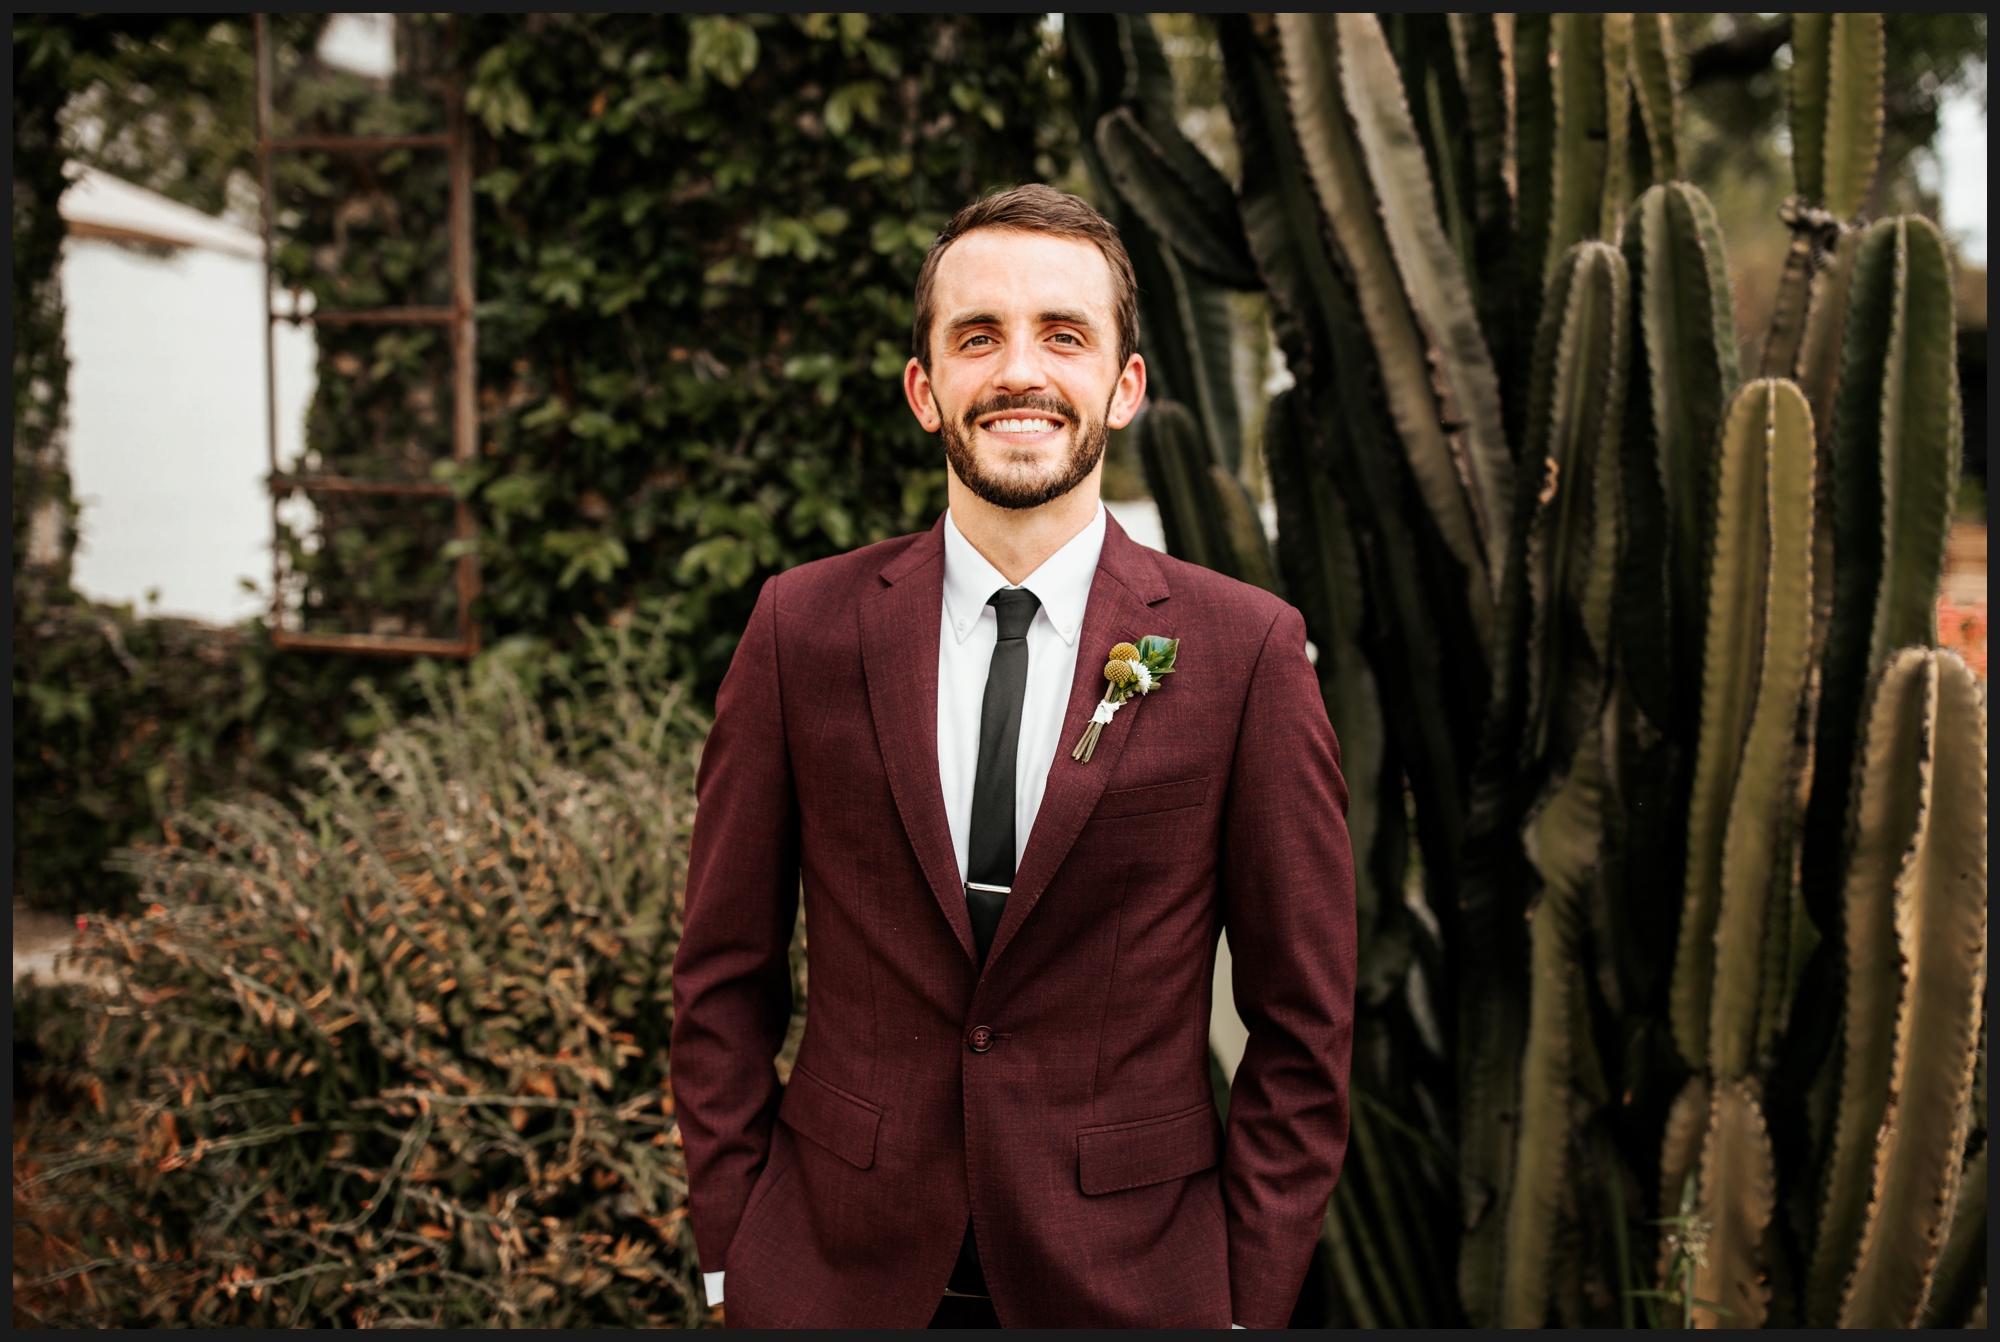 Orlando-Wedding-Photographer-destination-wedding-photographer-florida-wedding-photographer-bohemian-wedding-photographer_1986.jpg